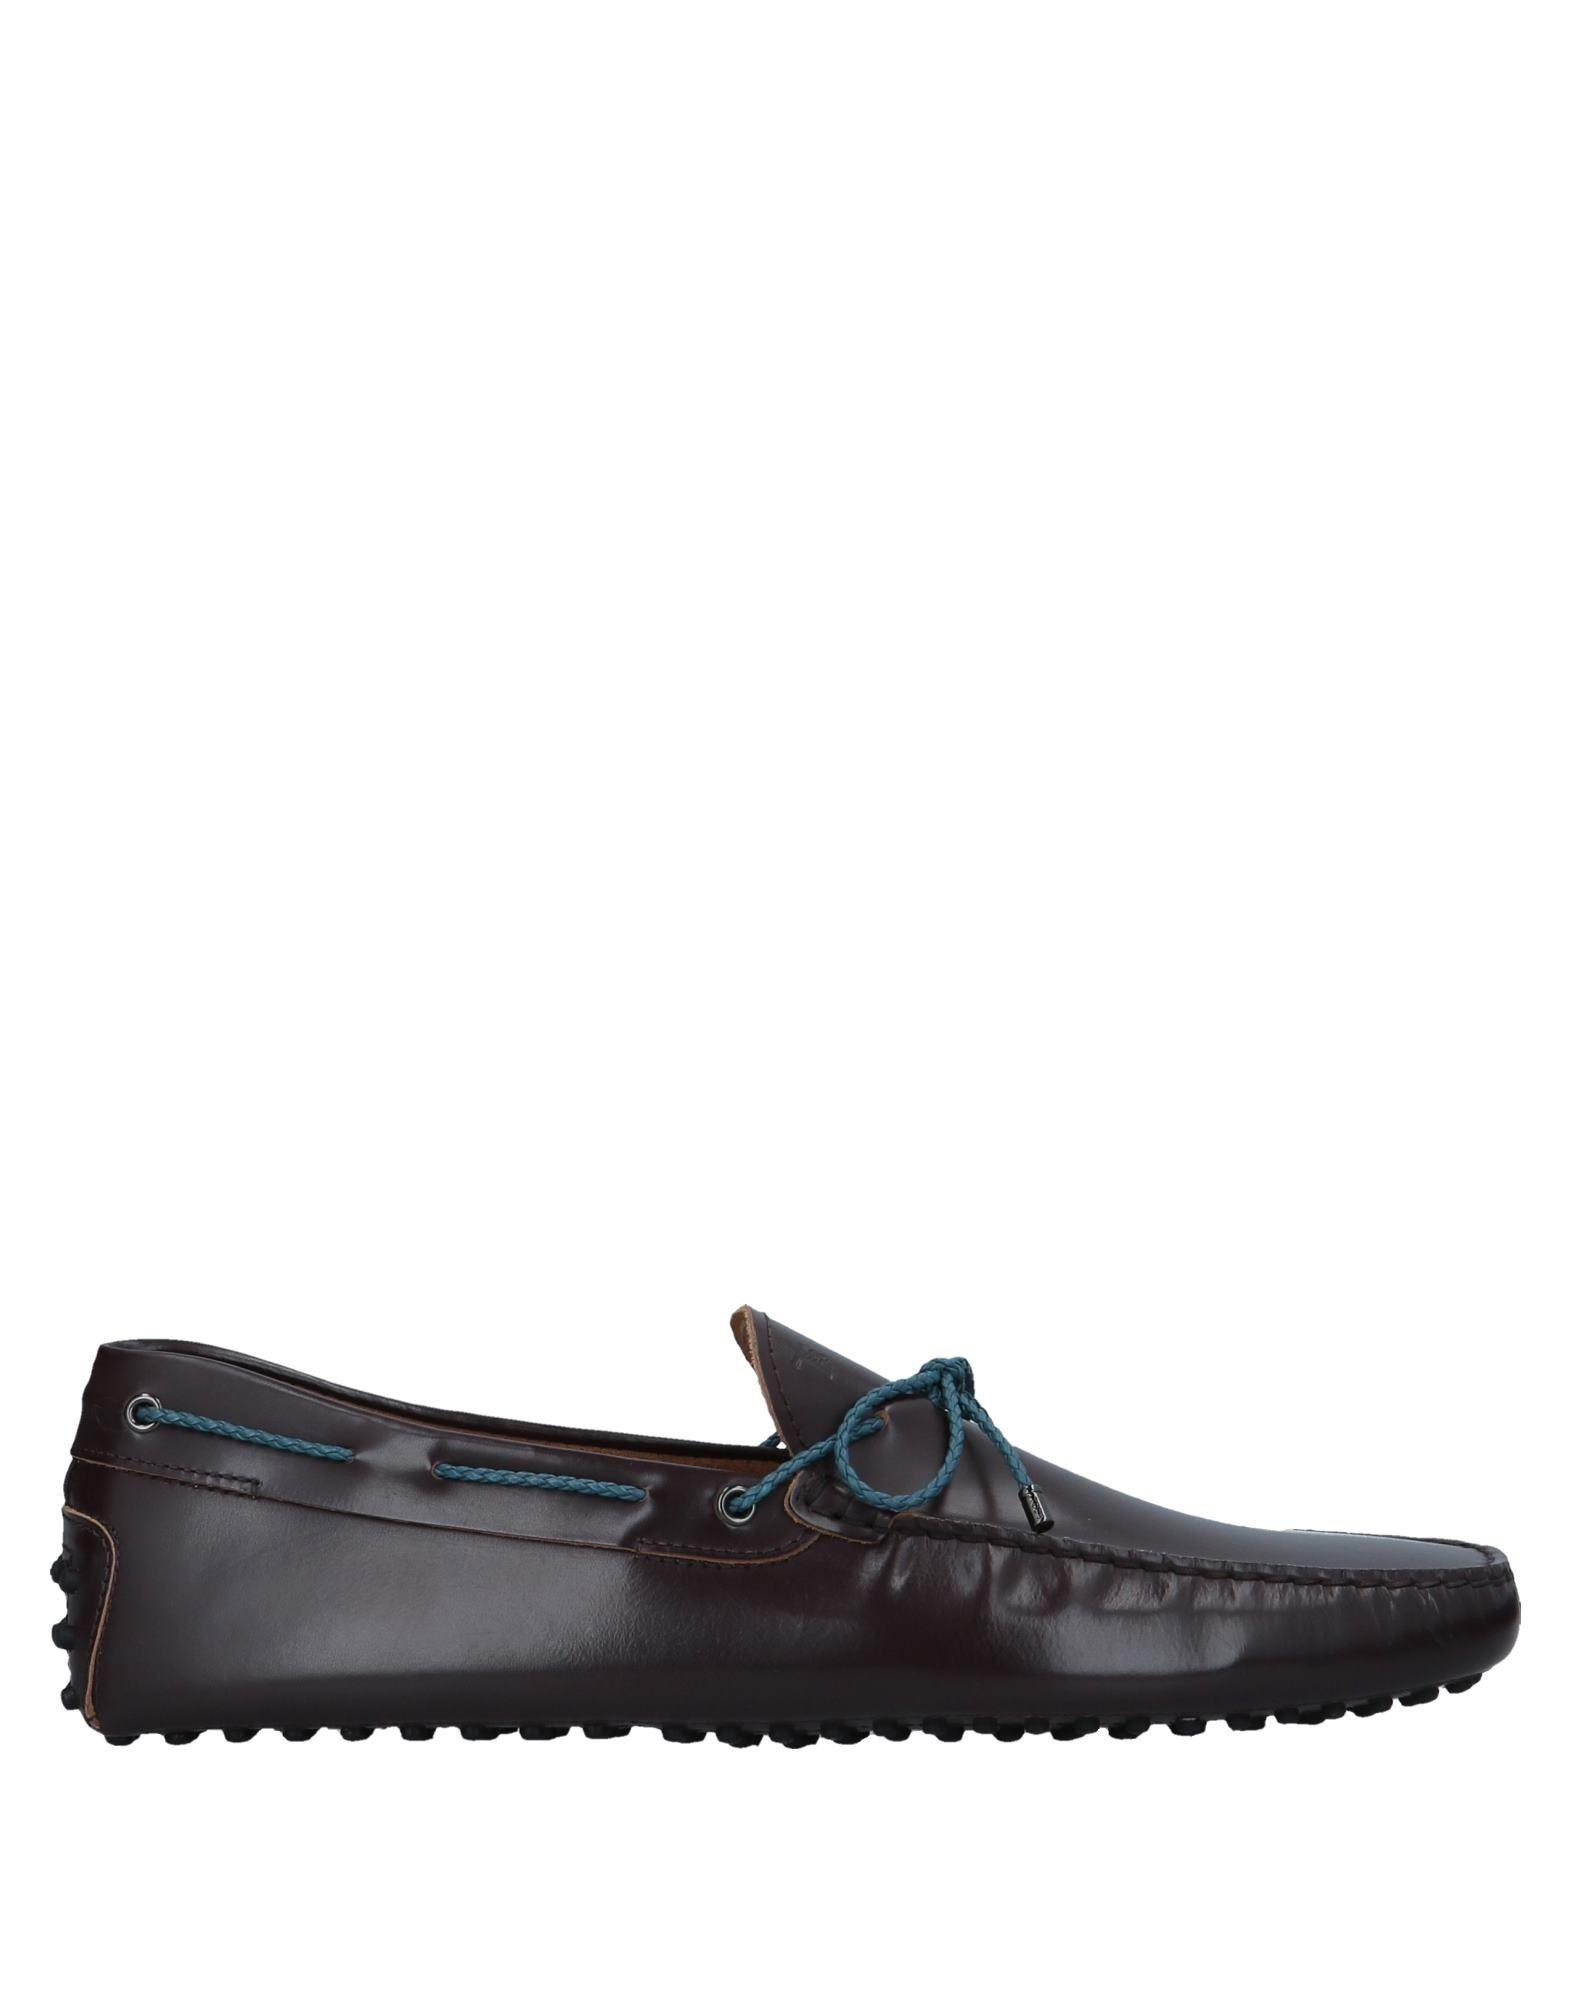 Tod's Mokassins Herren  11541191HH Gute Qualität beliebte Schuhe